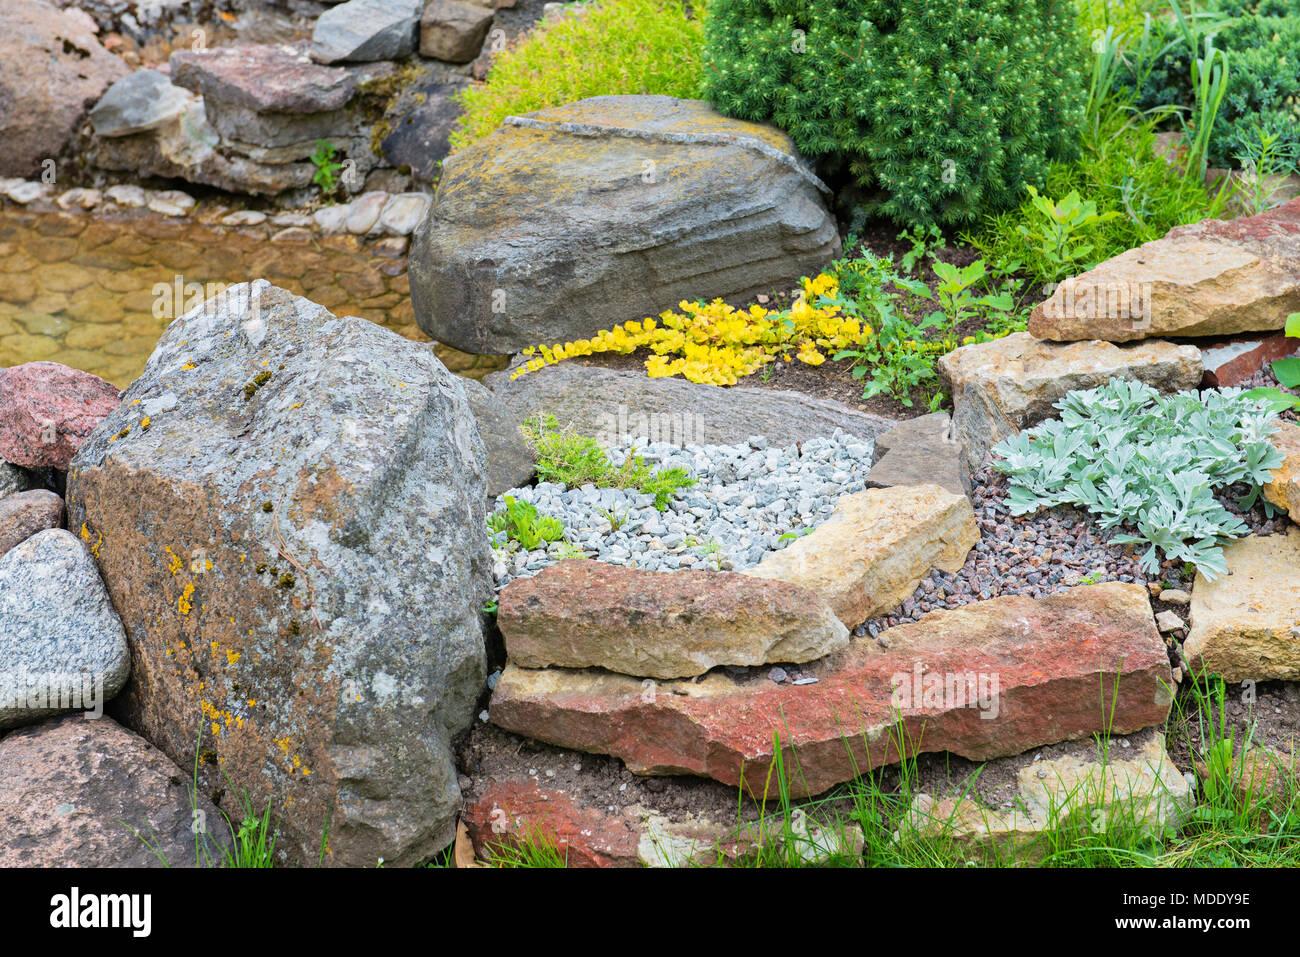 Modern Garden Design Rock Garden In Summer Stock Photo 180401018